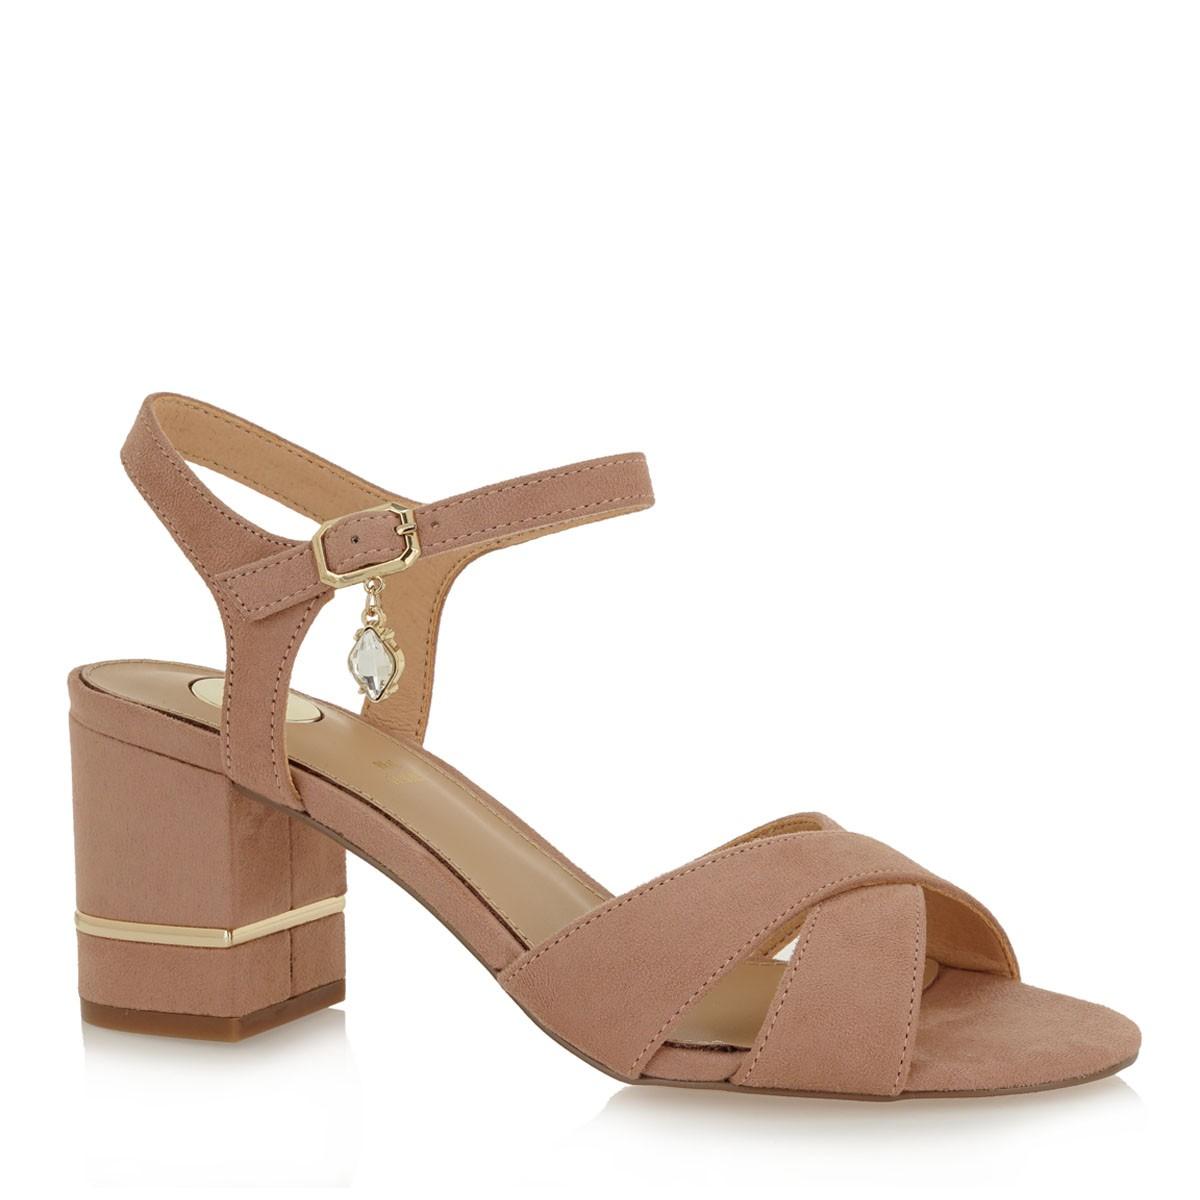 EXE Shoes Πέδιλα Γυναικεία PENNY-225 Nude Καστόρι K4700225471D